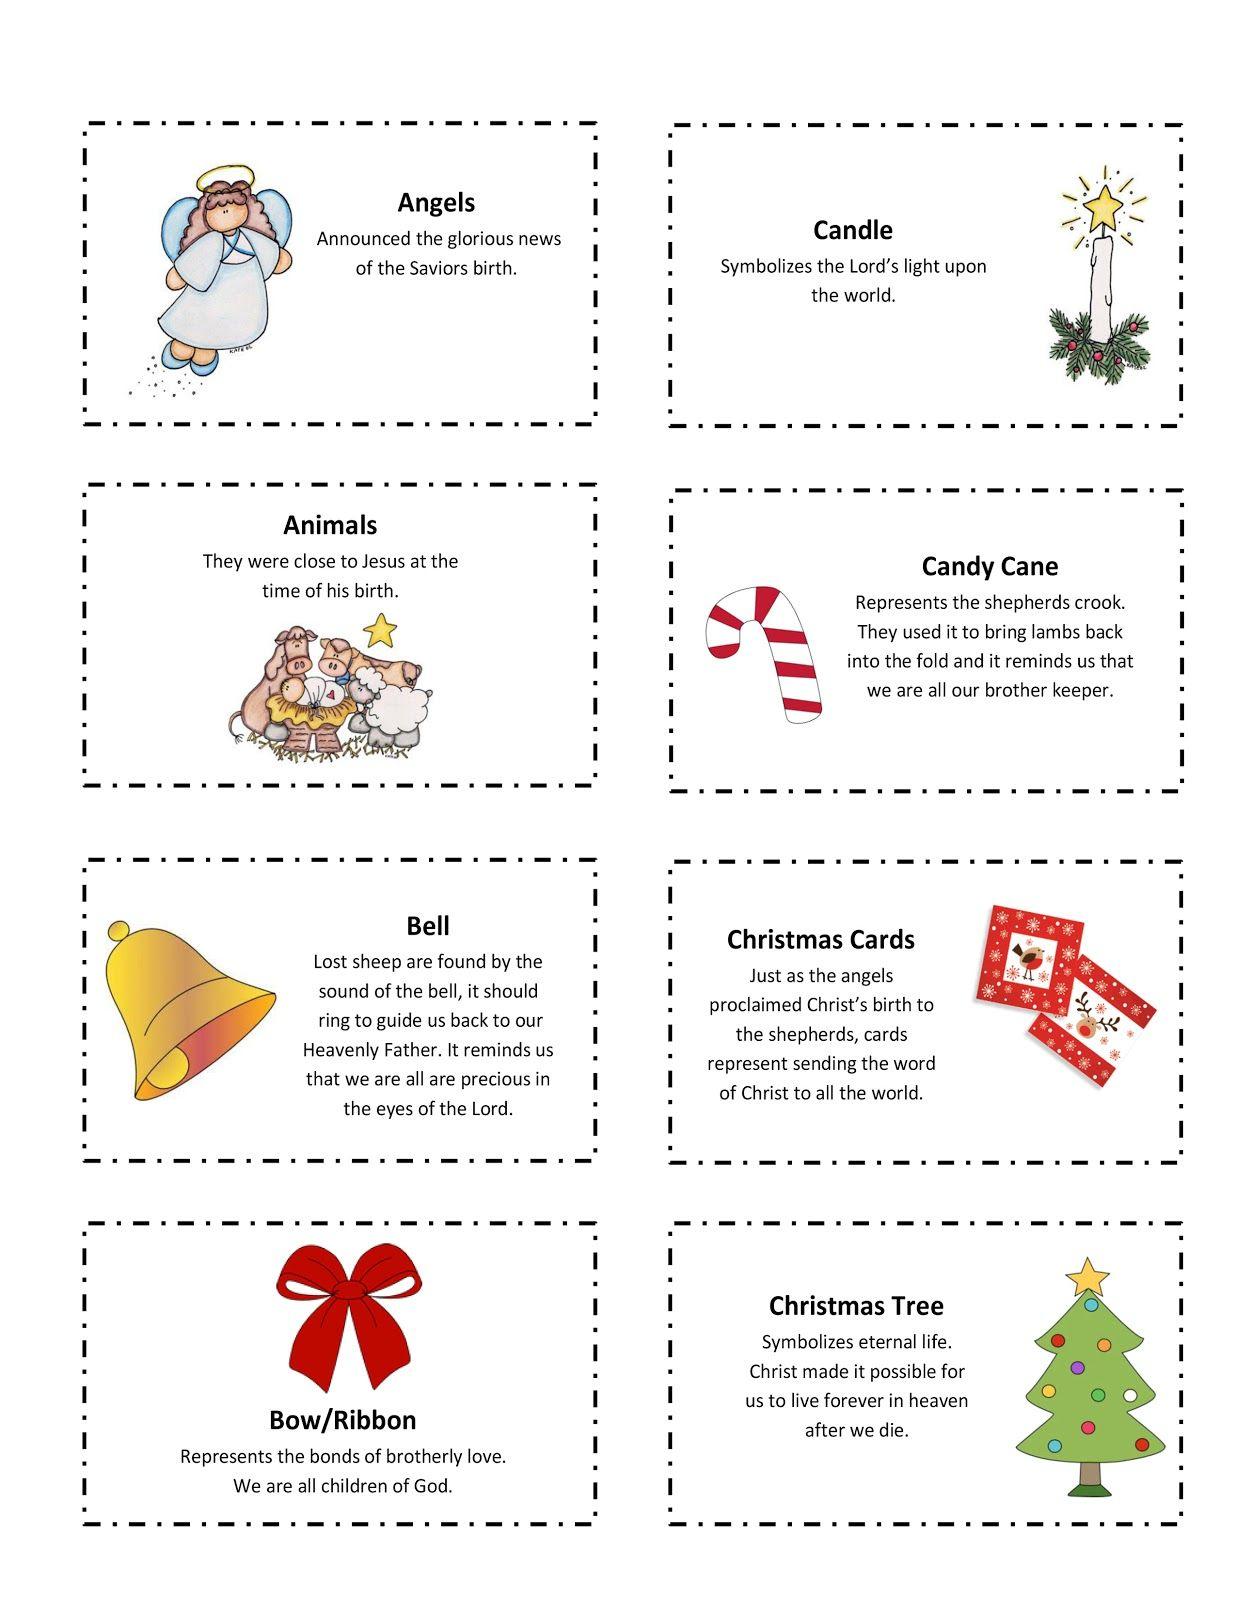 Ourhomecreations: Free Printable With 25 Days Of Christmas Symbols | Christian Christmas Worksheets Printable Free